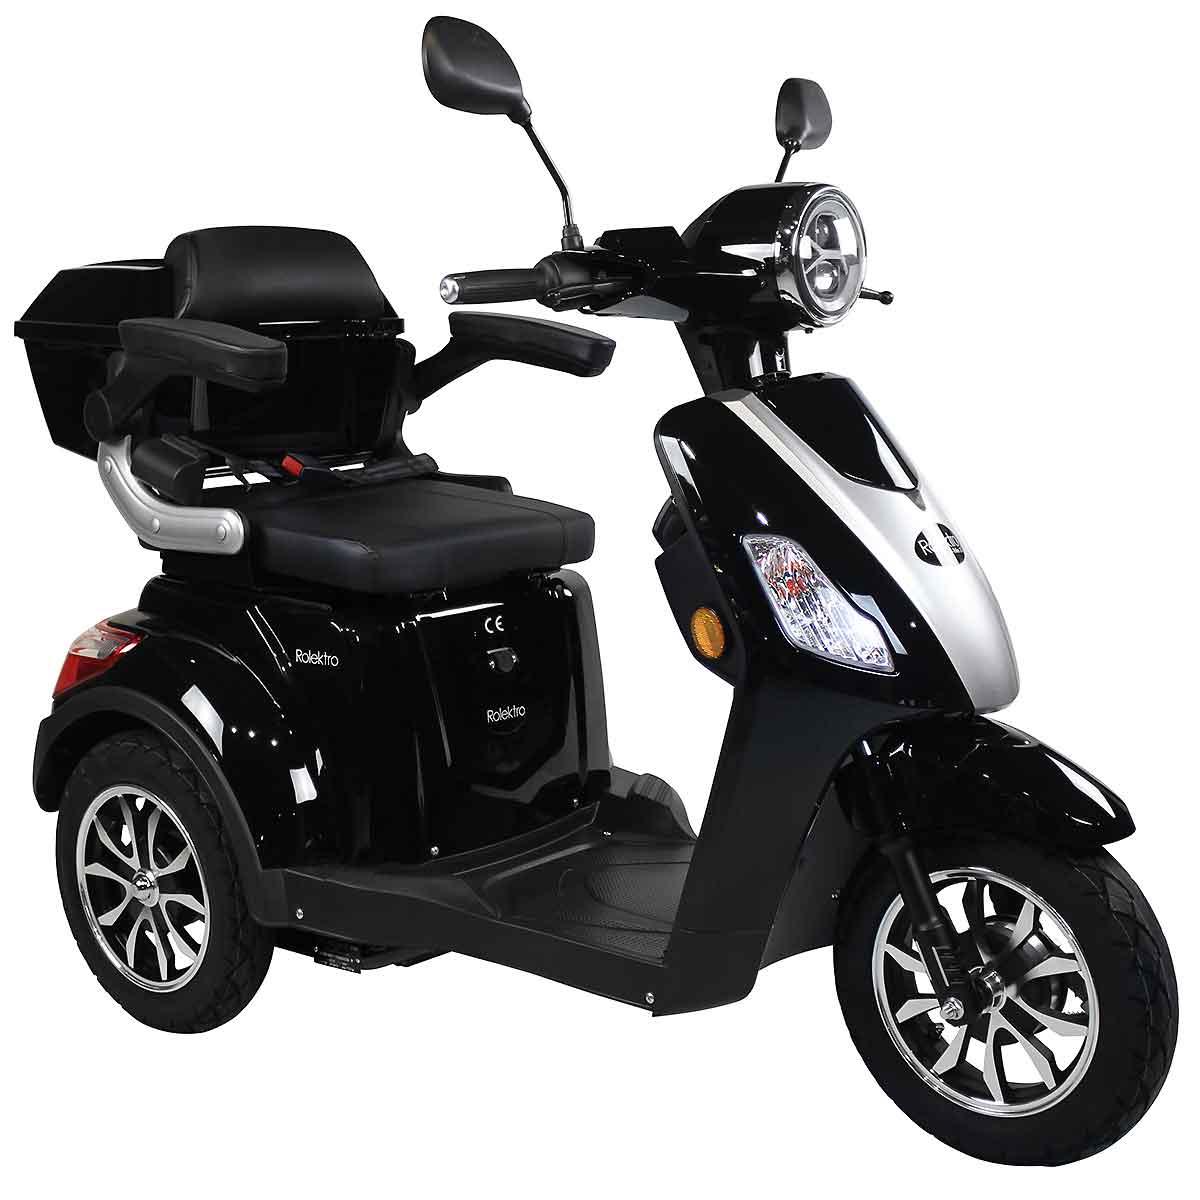 Seniorenmobil, Elektromobil, Elektrodreirad Rolektro 1000/30 schwarz Bild 1